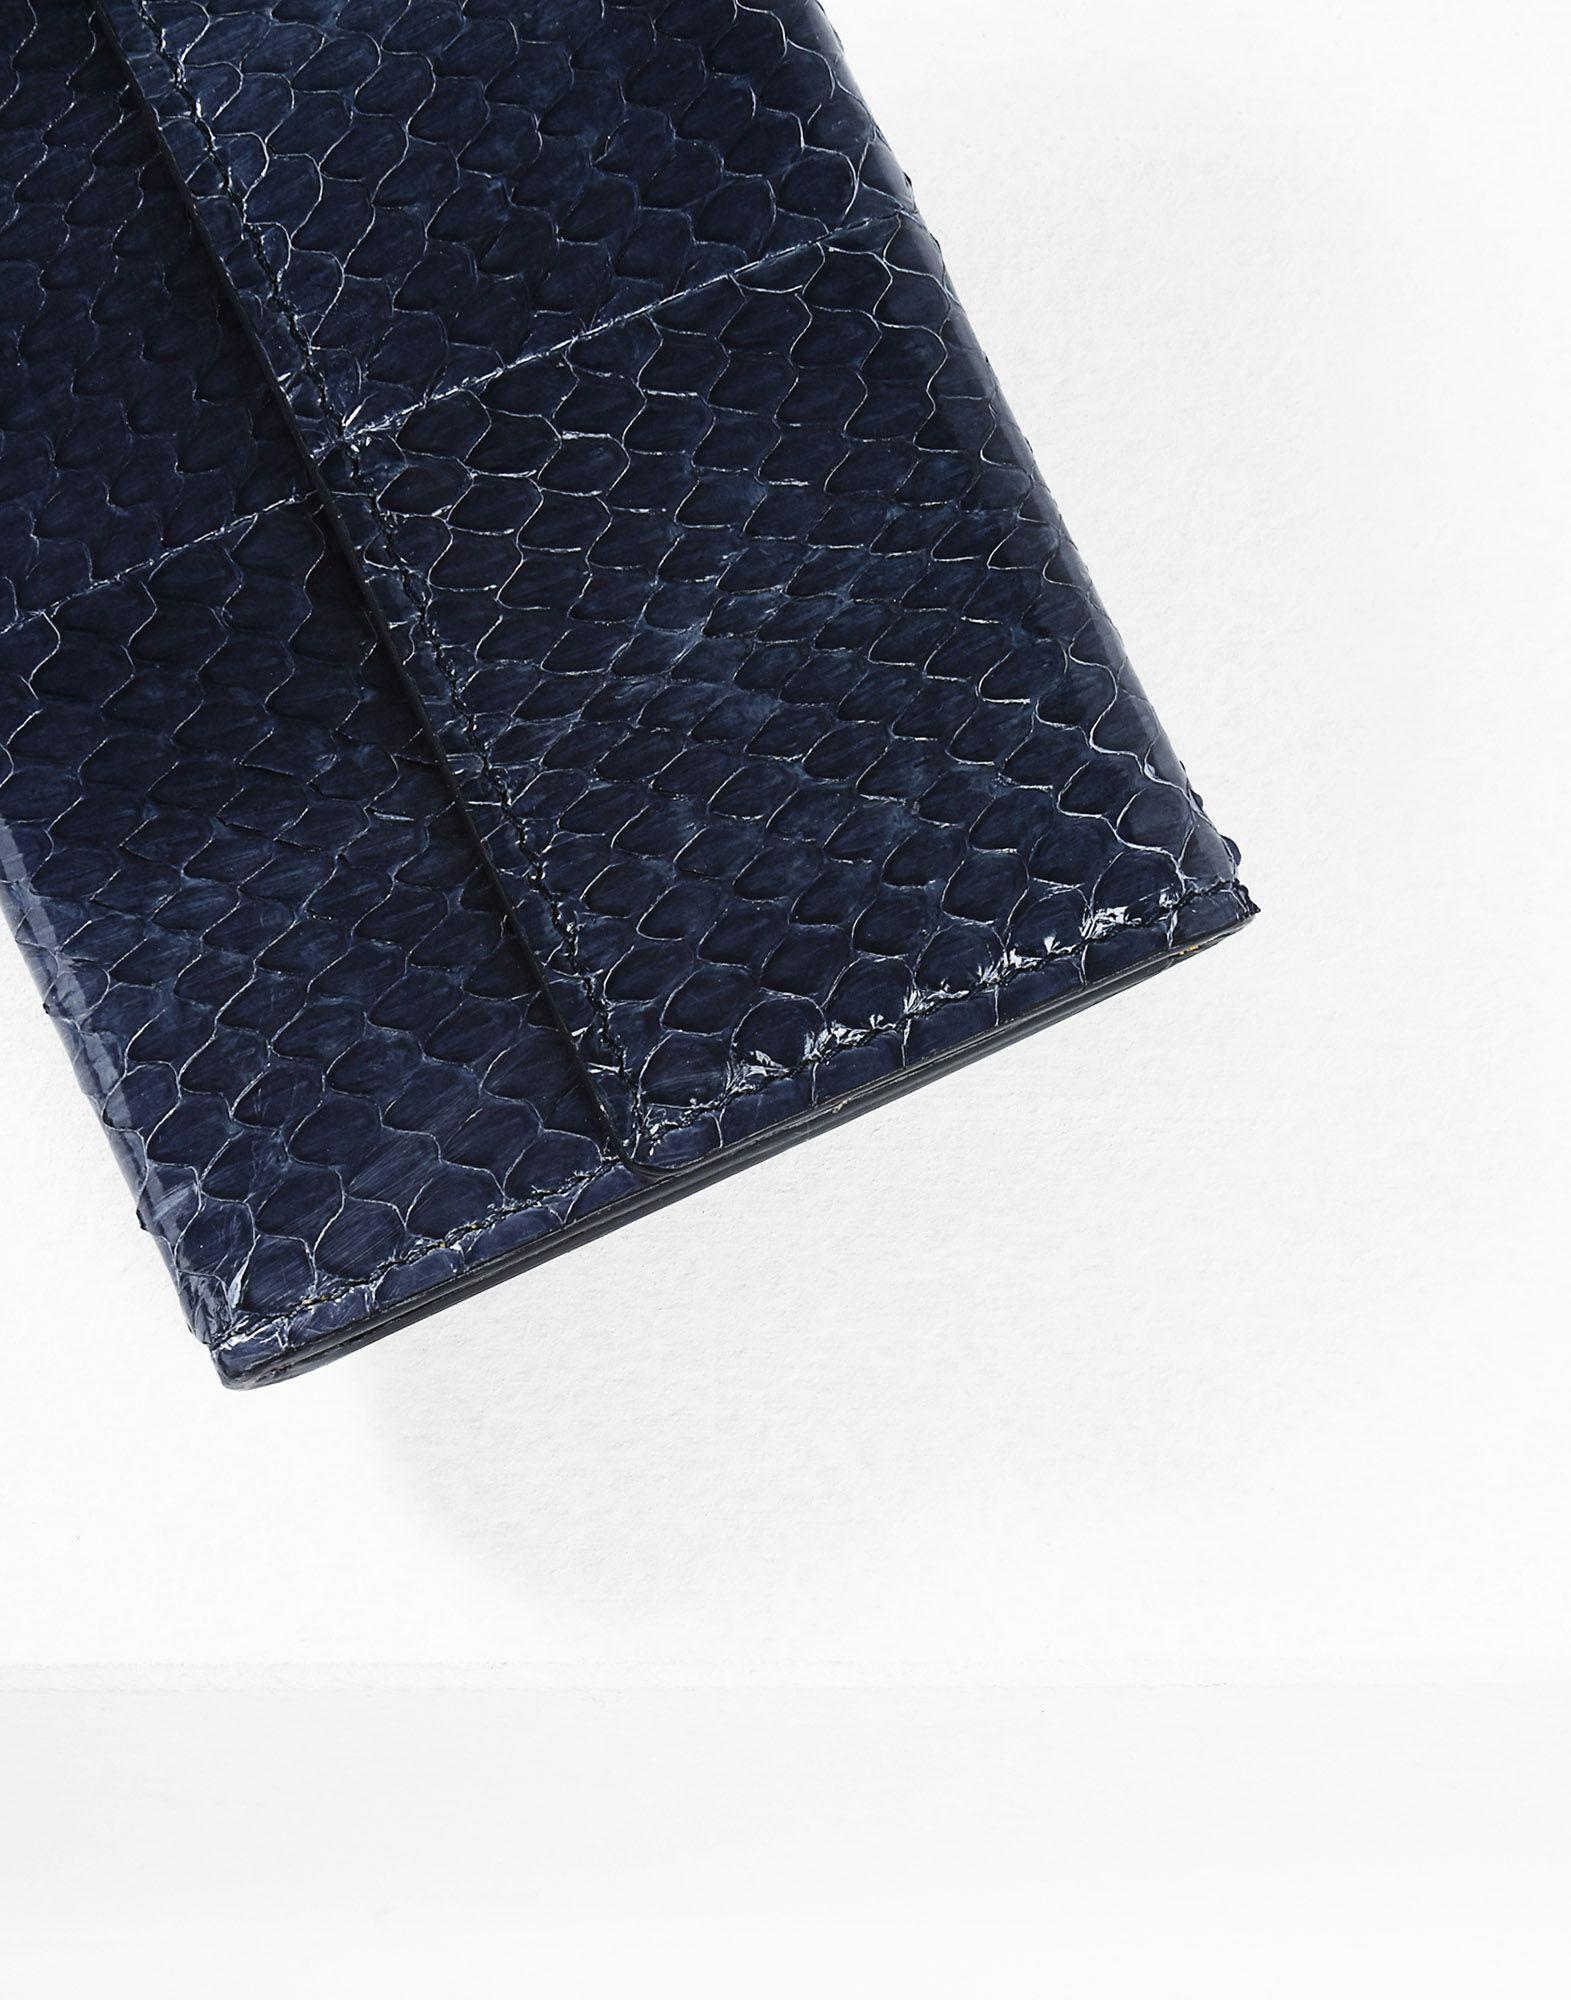 Coin purse - JIL SANDER Online Store